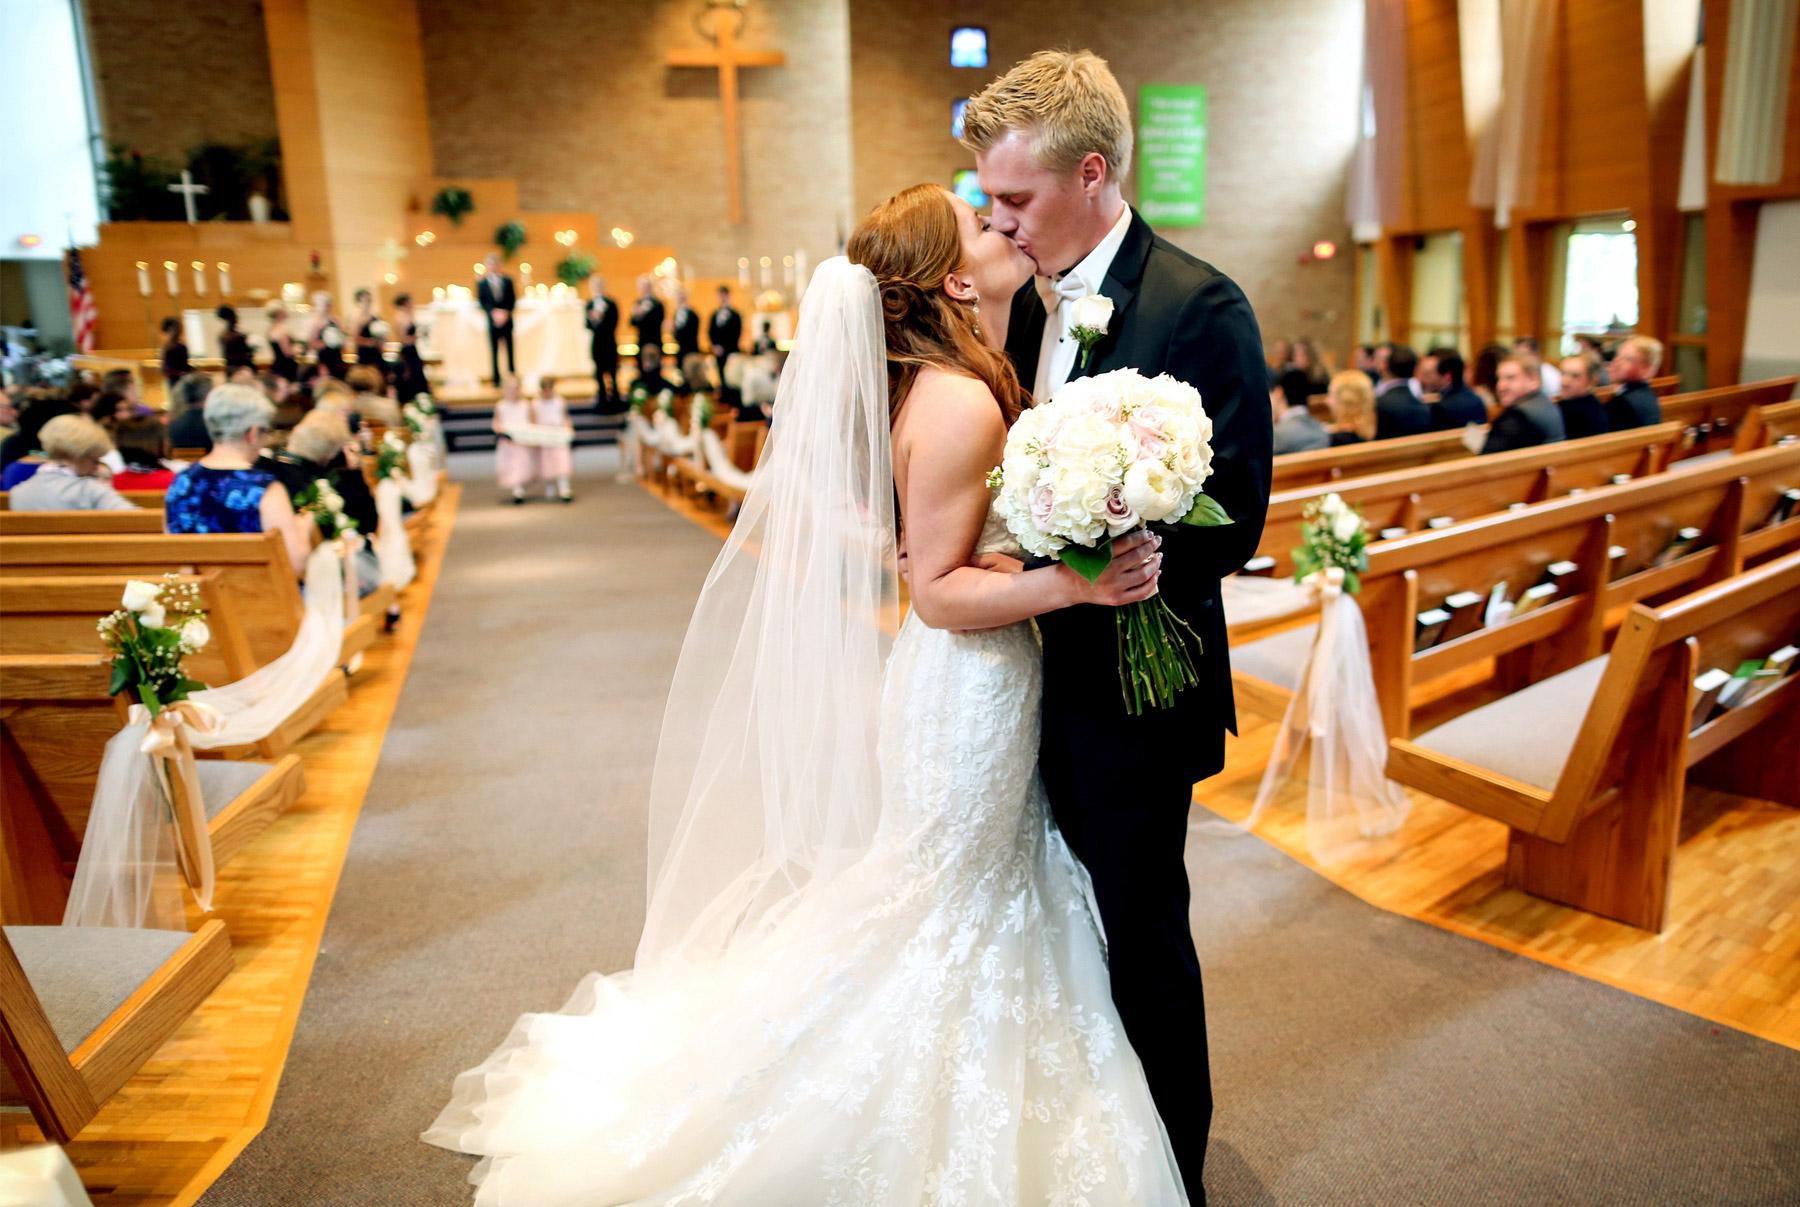 09-Minneapolis-Minnesota-Wedding-Photography-by-Vick-Photography-Ceremony-Woodbury-Lutheran-Church-Tianna-&-Matt.jpg